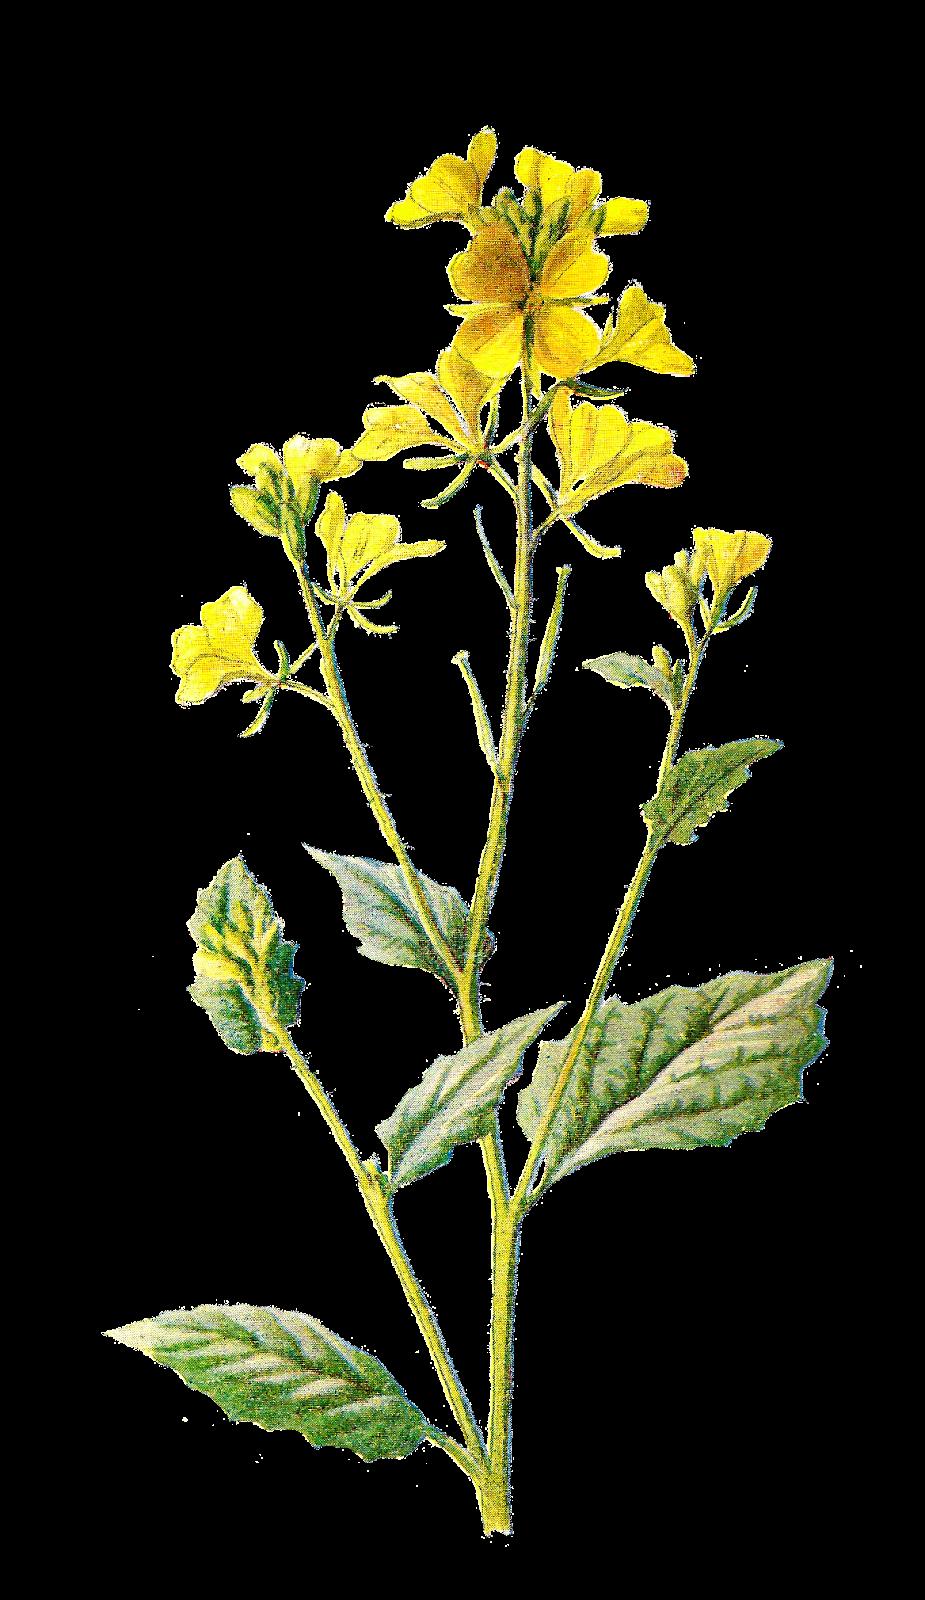 Antique Images: Free Digital Wildflower Downloads ...